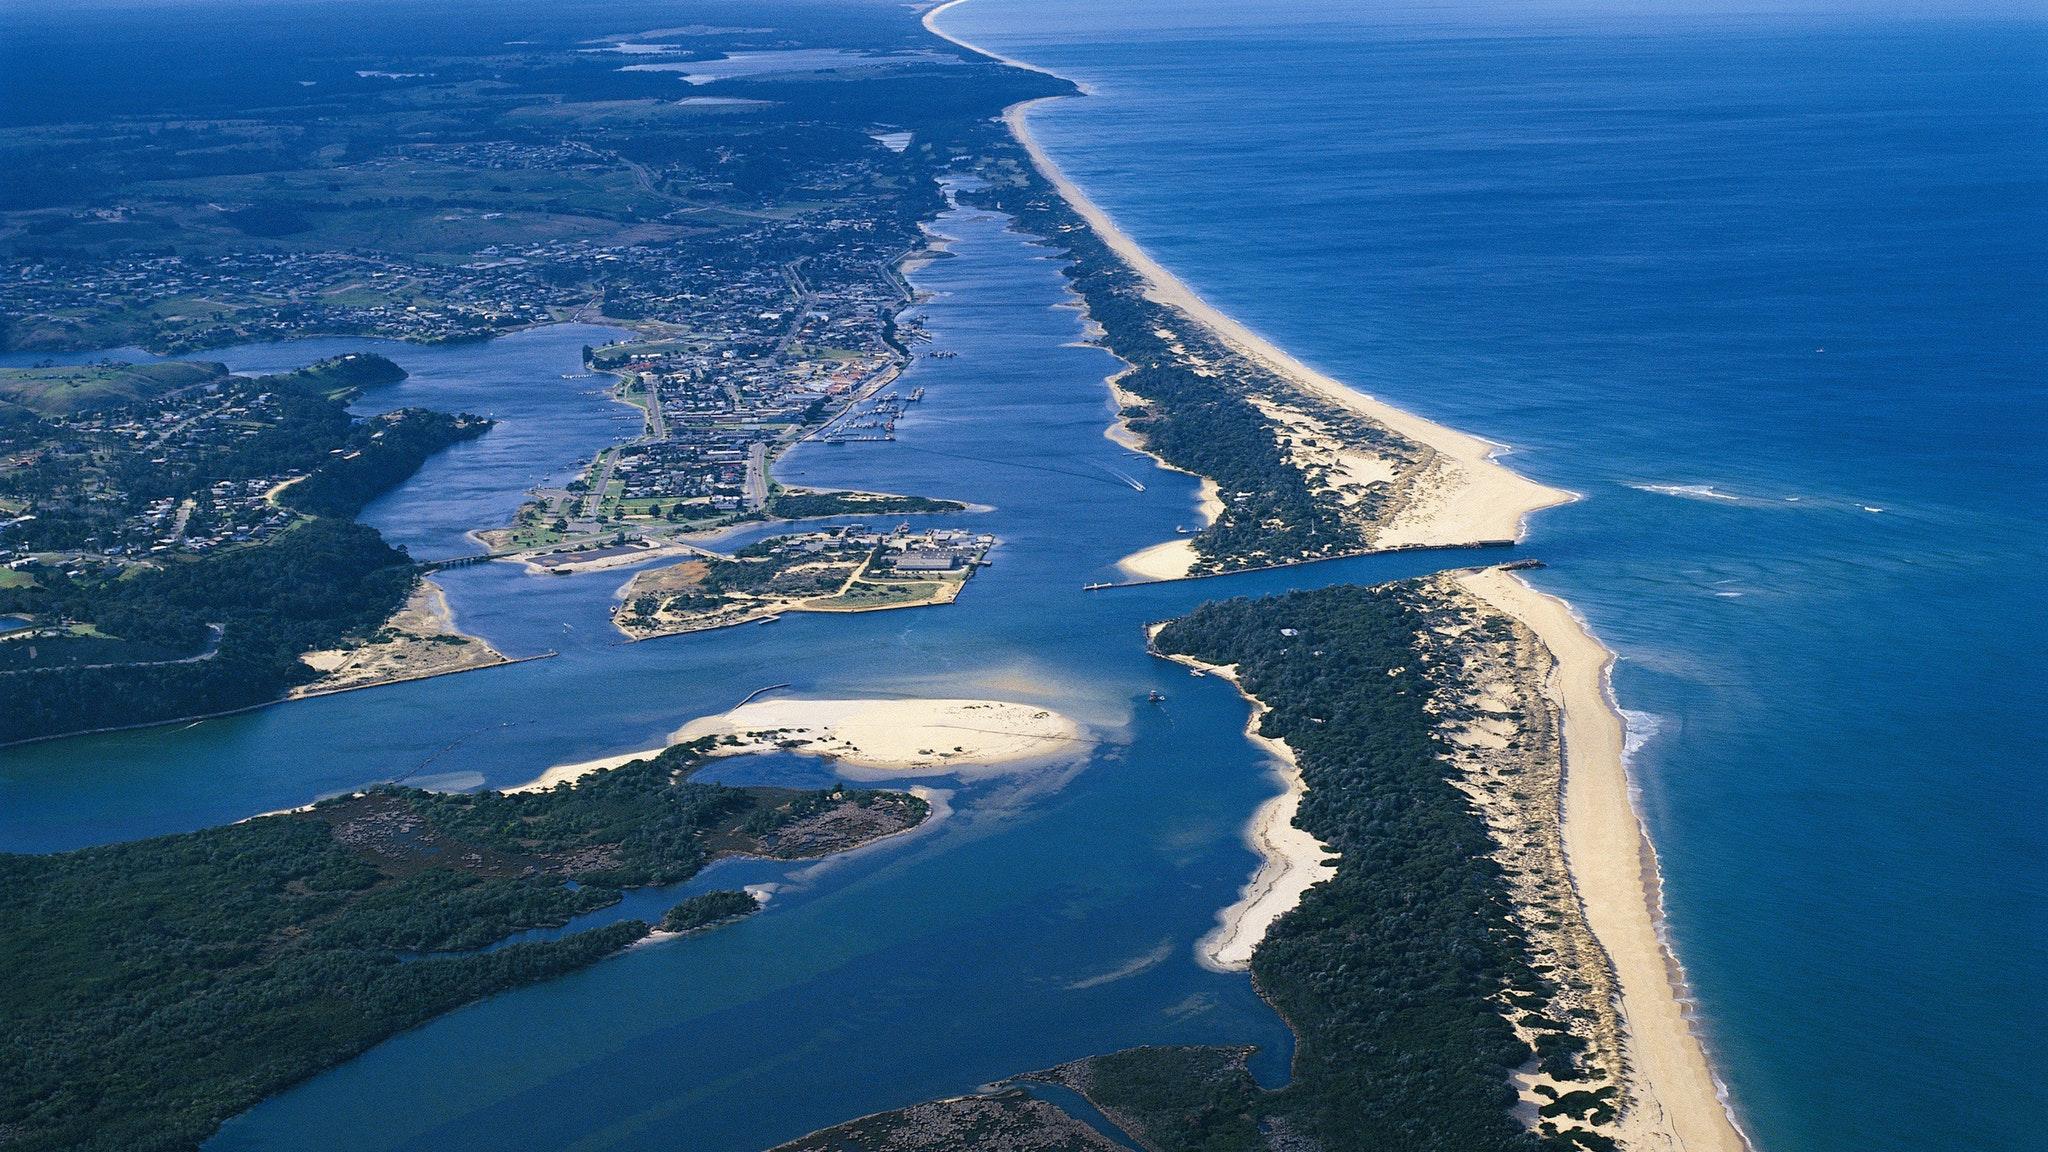 Ninety Mile Beach Marine National Park